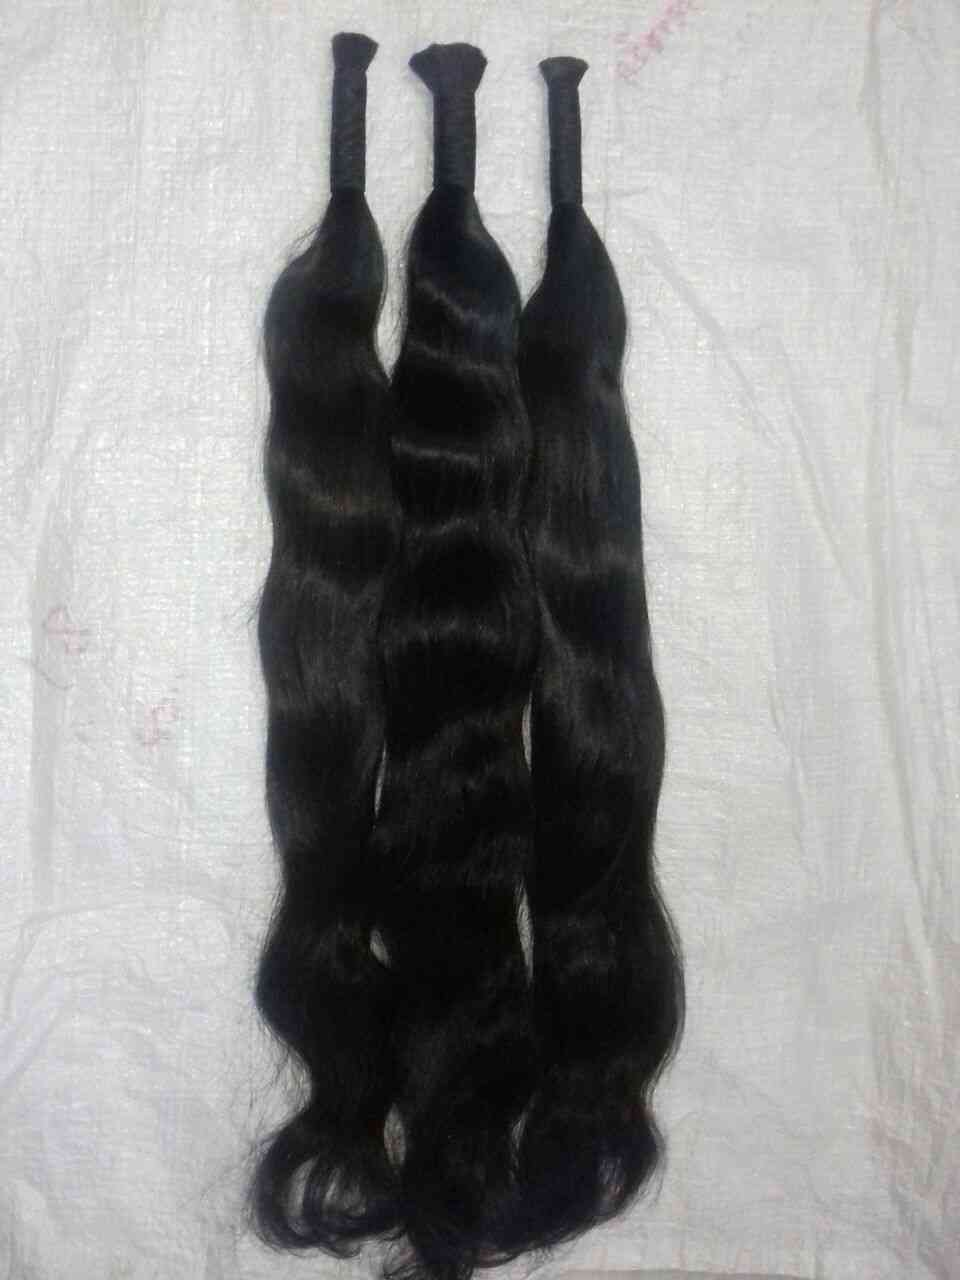 Bulk human hair good quality